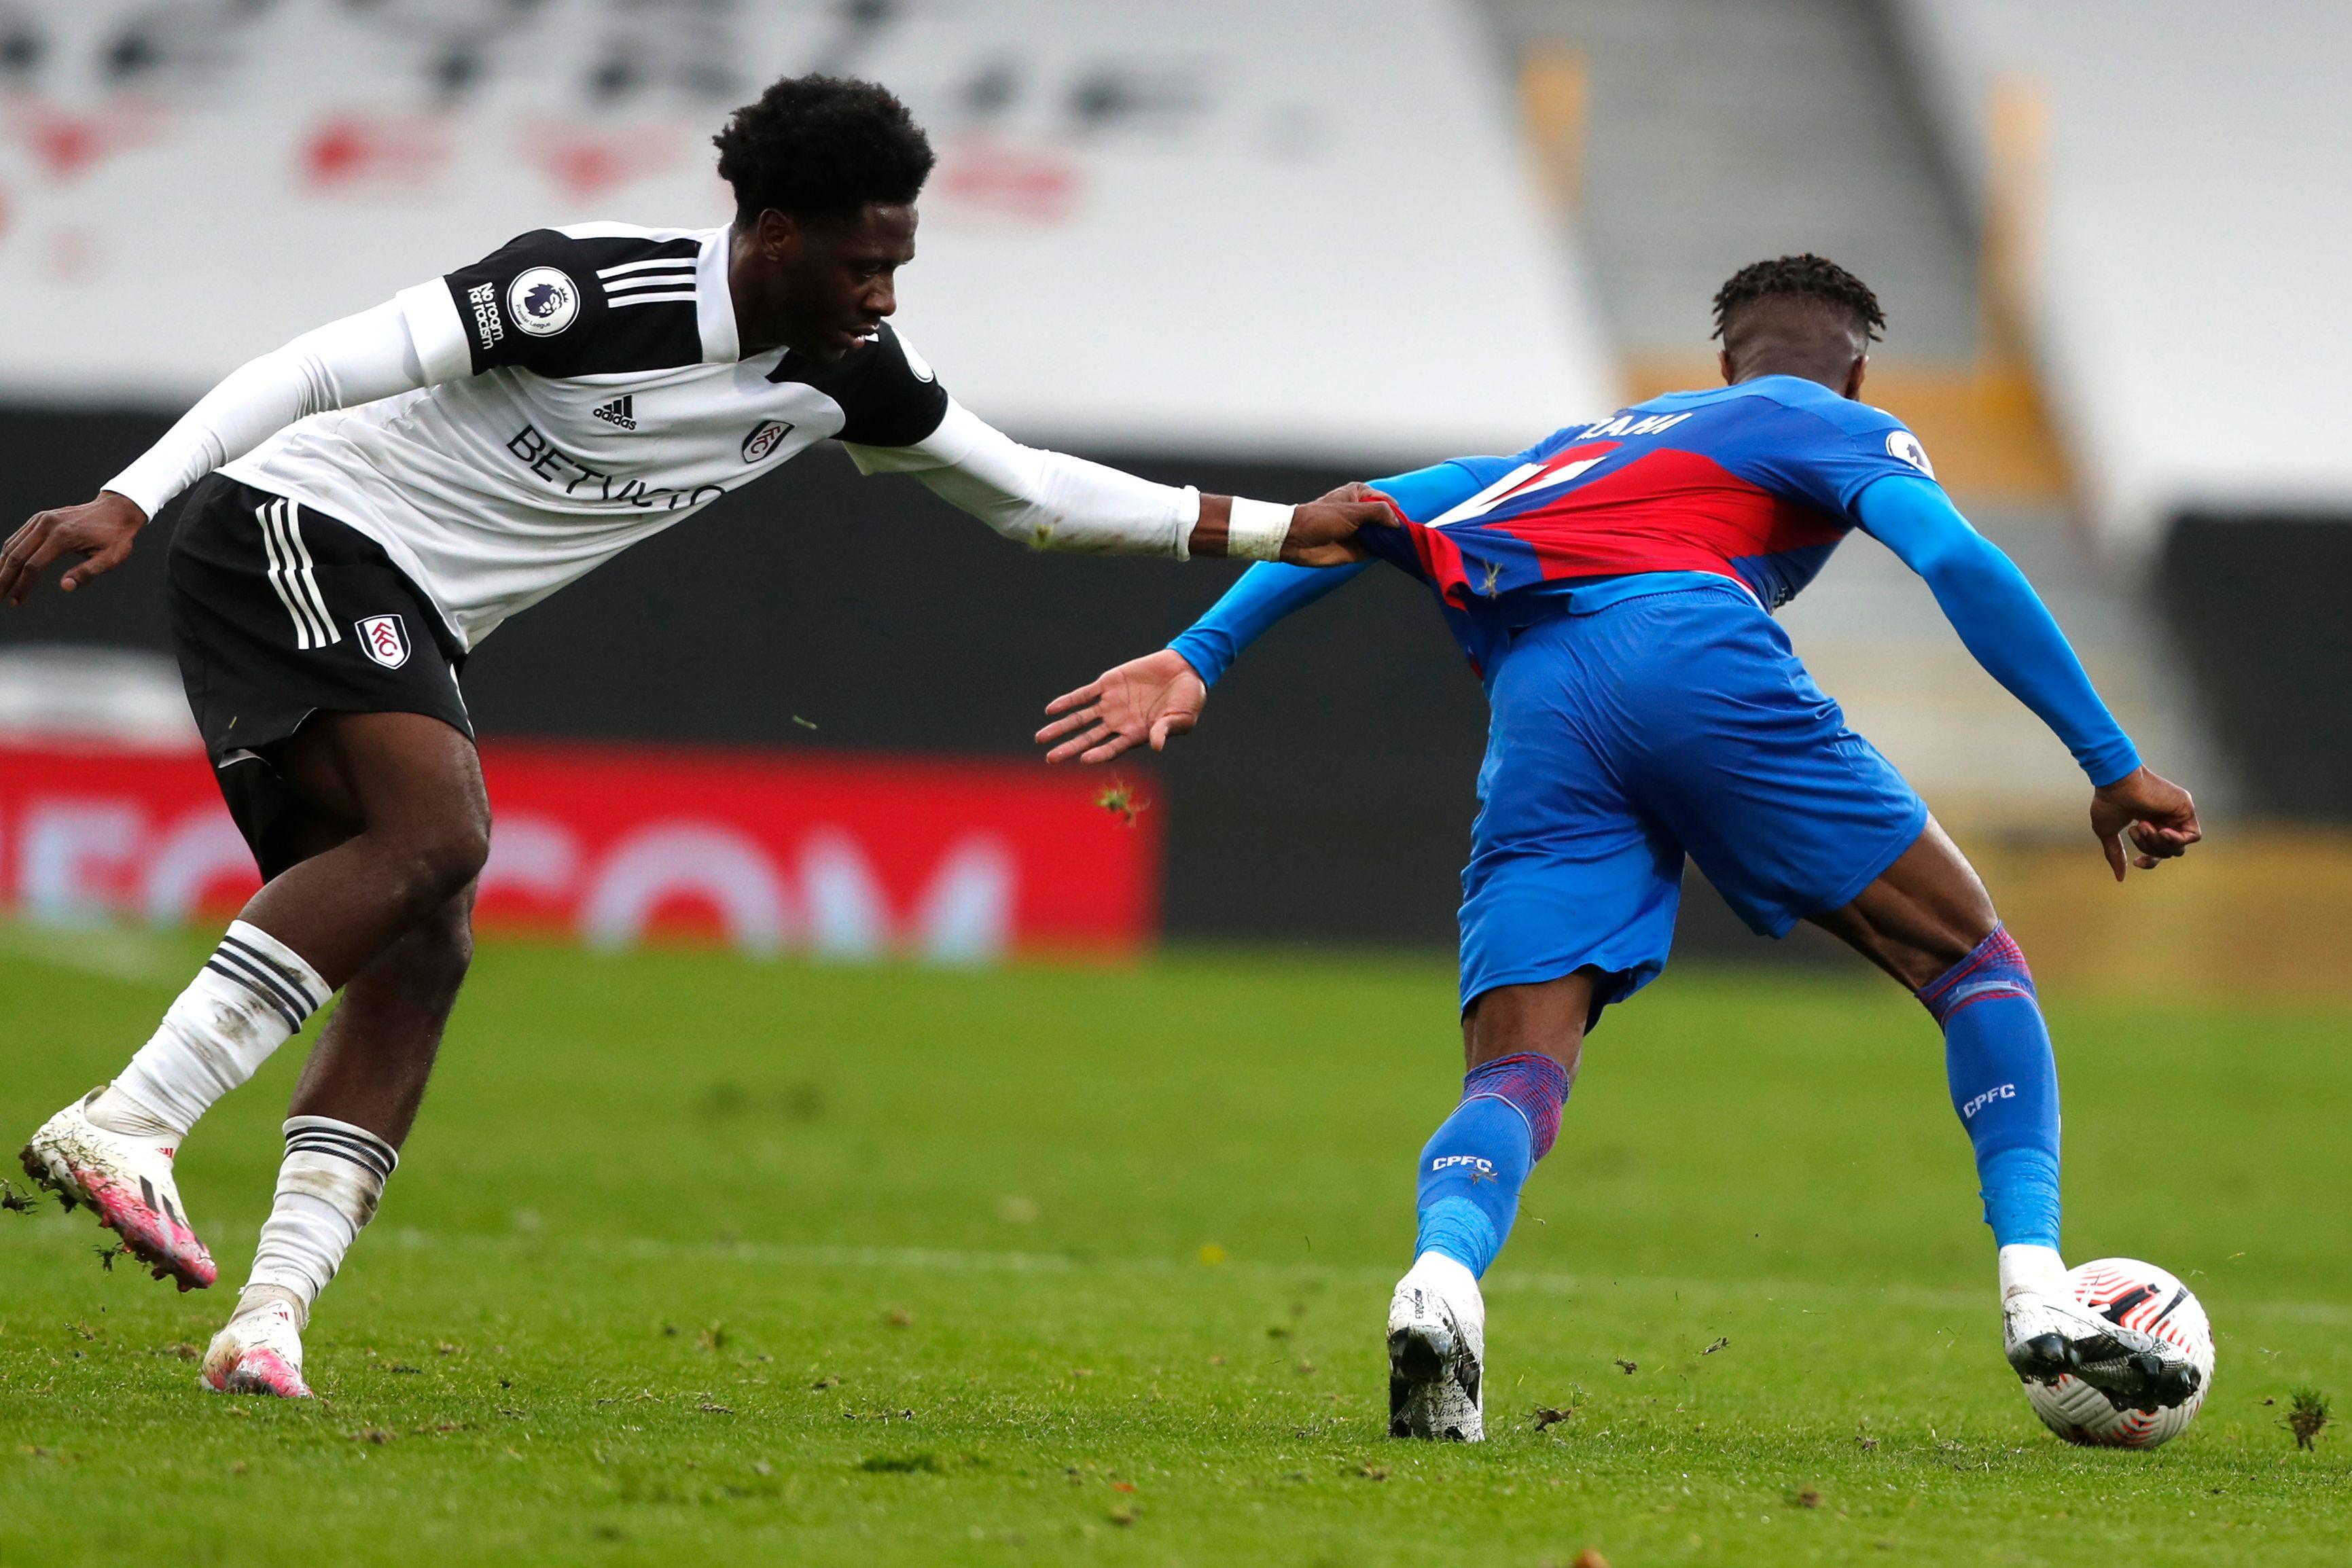 Nigerian defender Ola Aina pulls the shirt of Ivorian striker Wilfried Zaha - Fulham vs Crystal Palace - Premier League